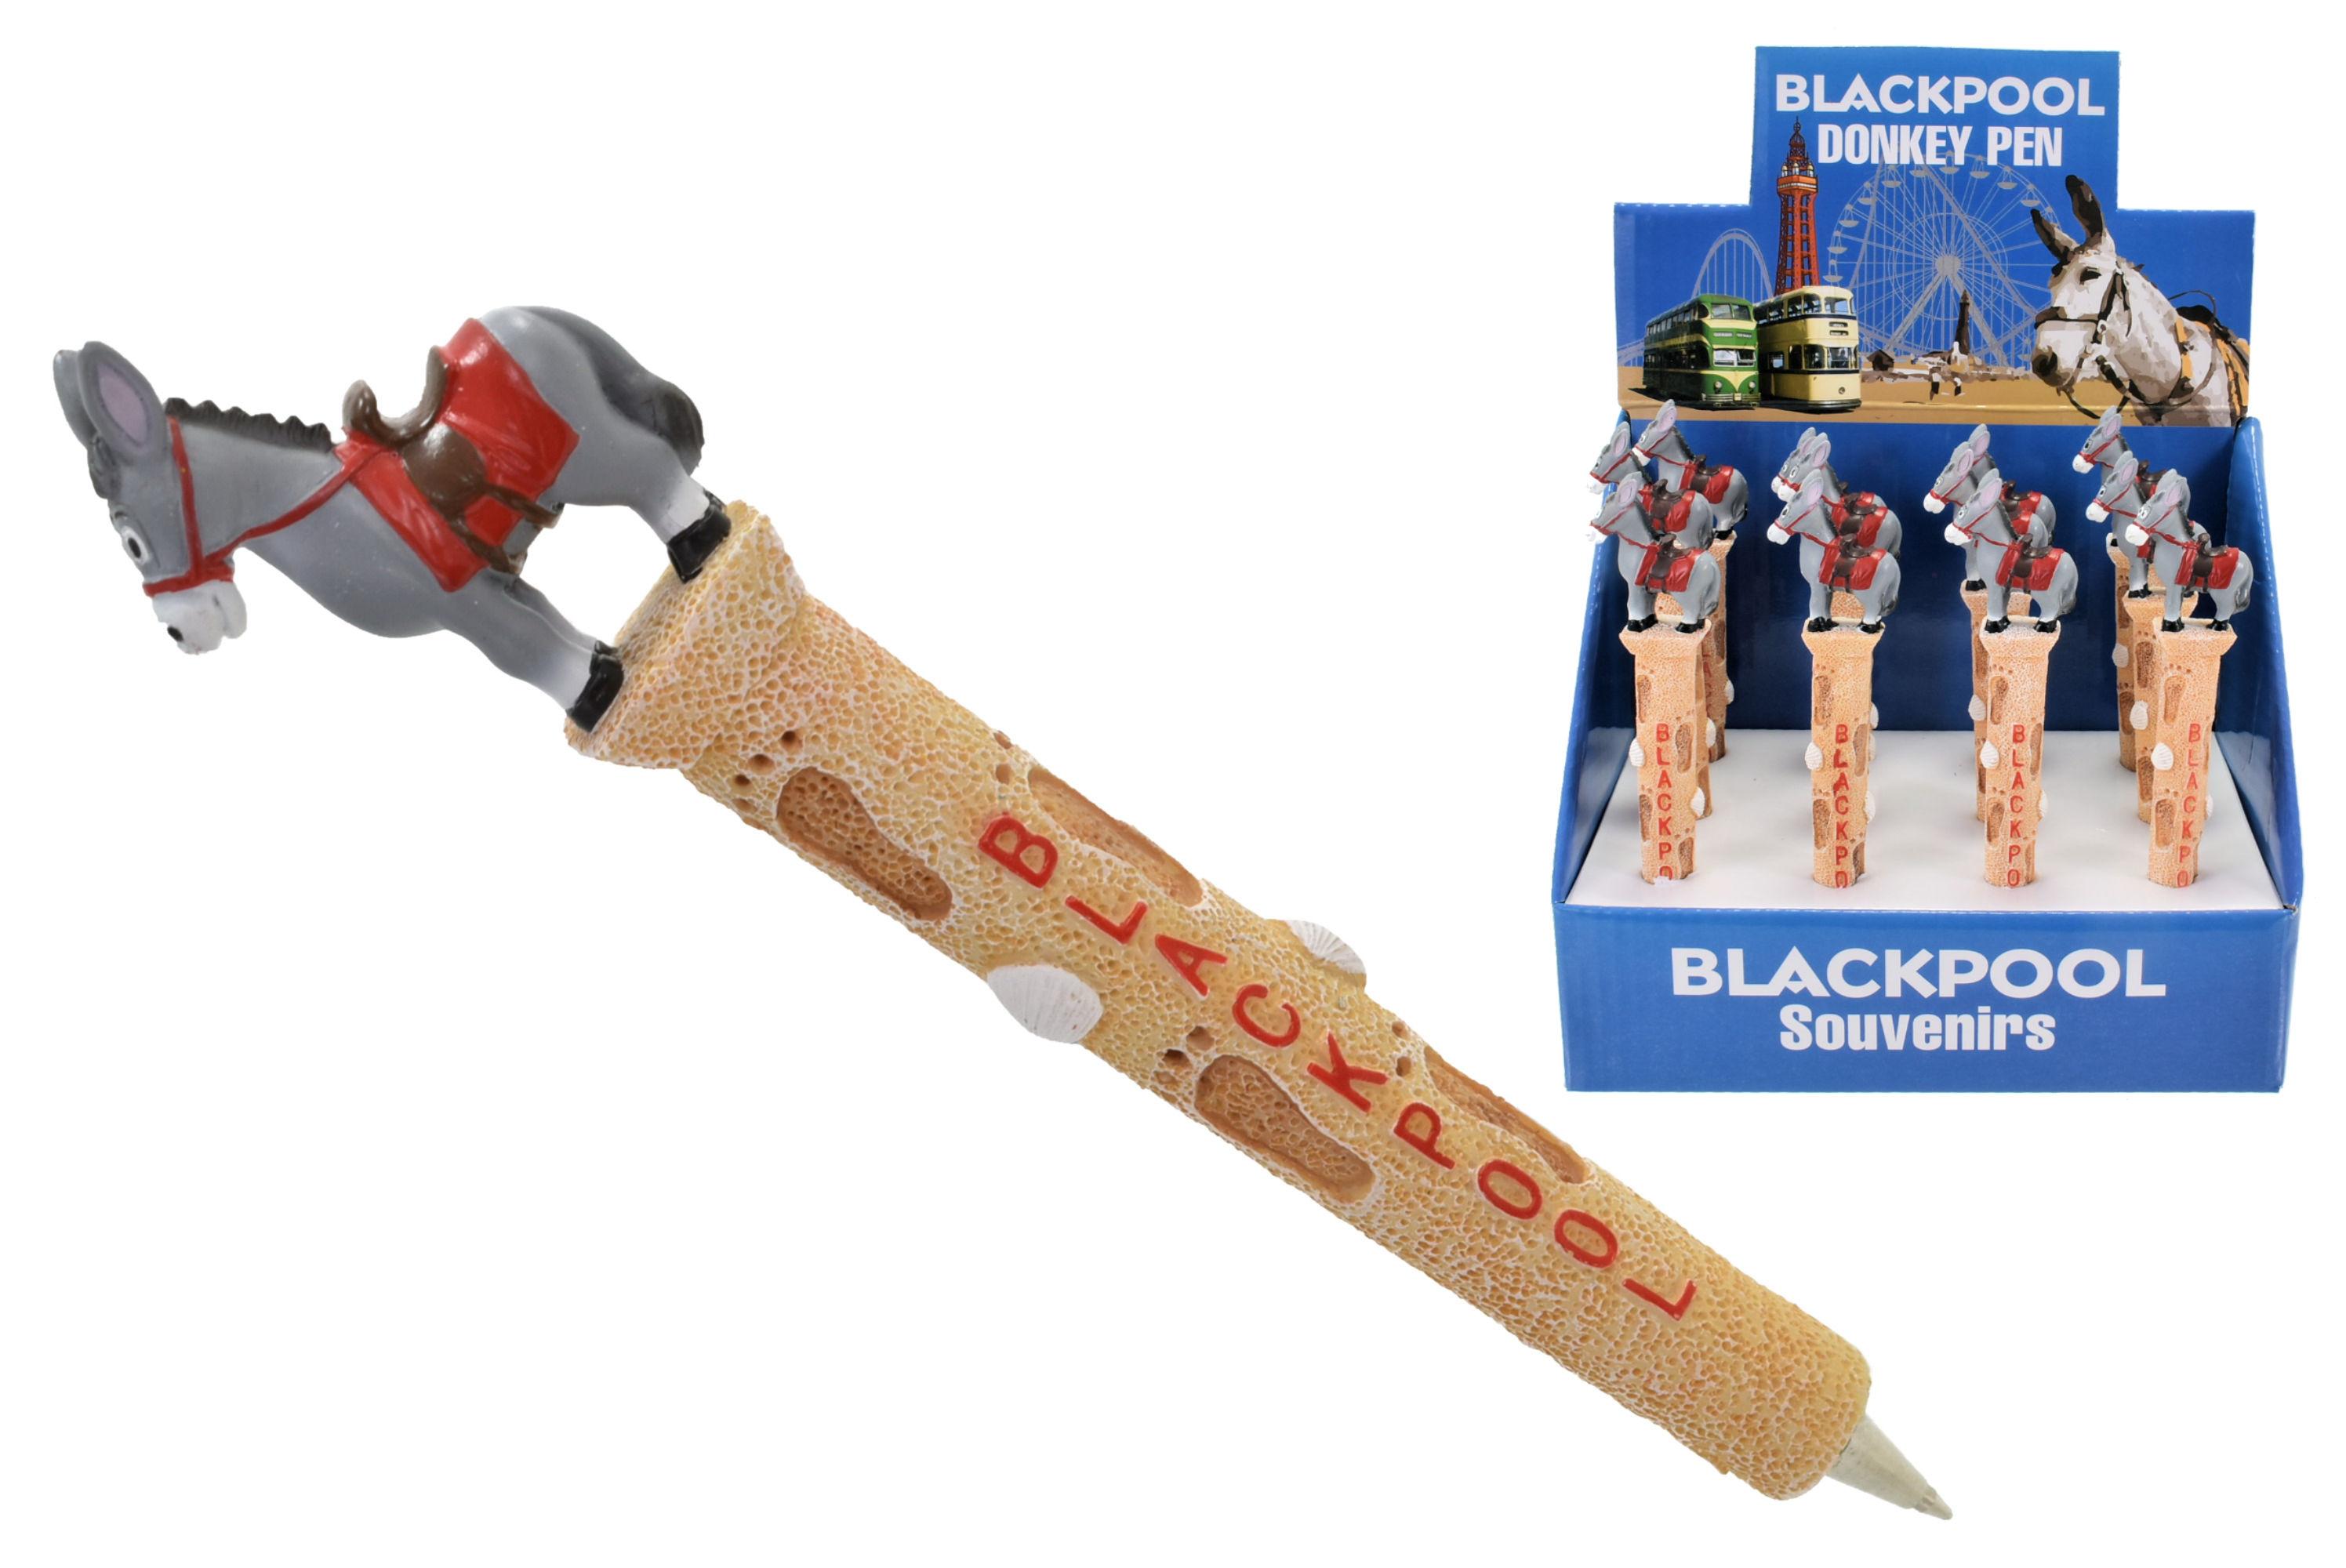 Blackpool Donkey Resin Pen In Display Box